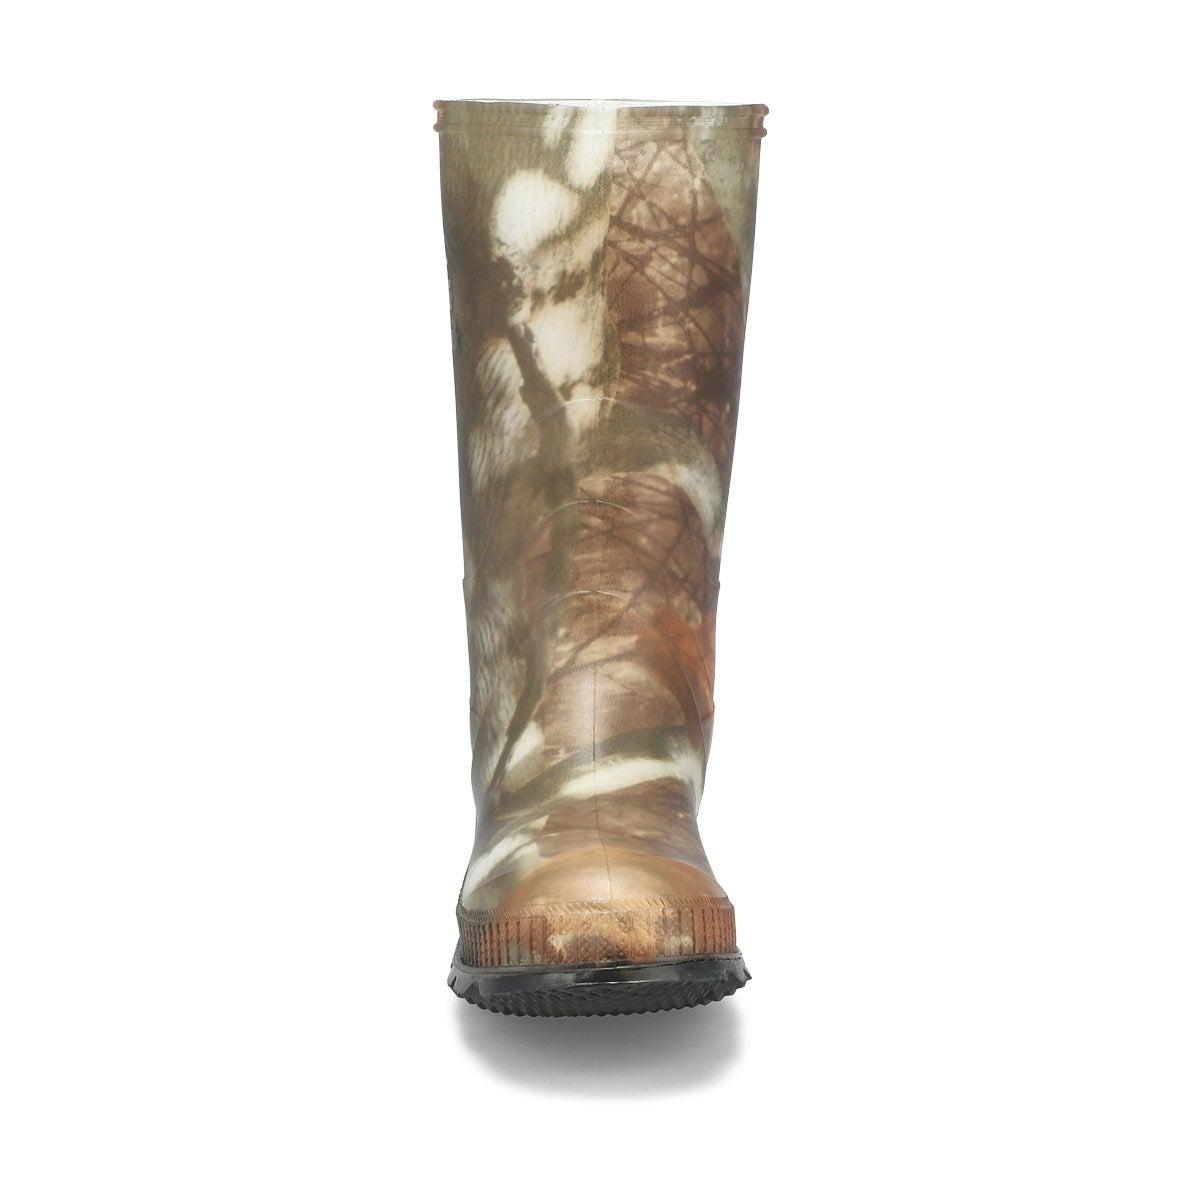 Bys Stompcamo waterproof rain boot